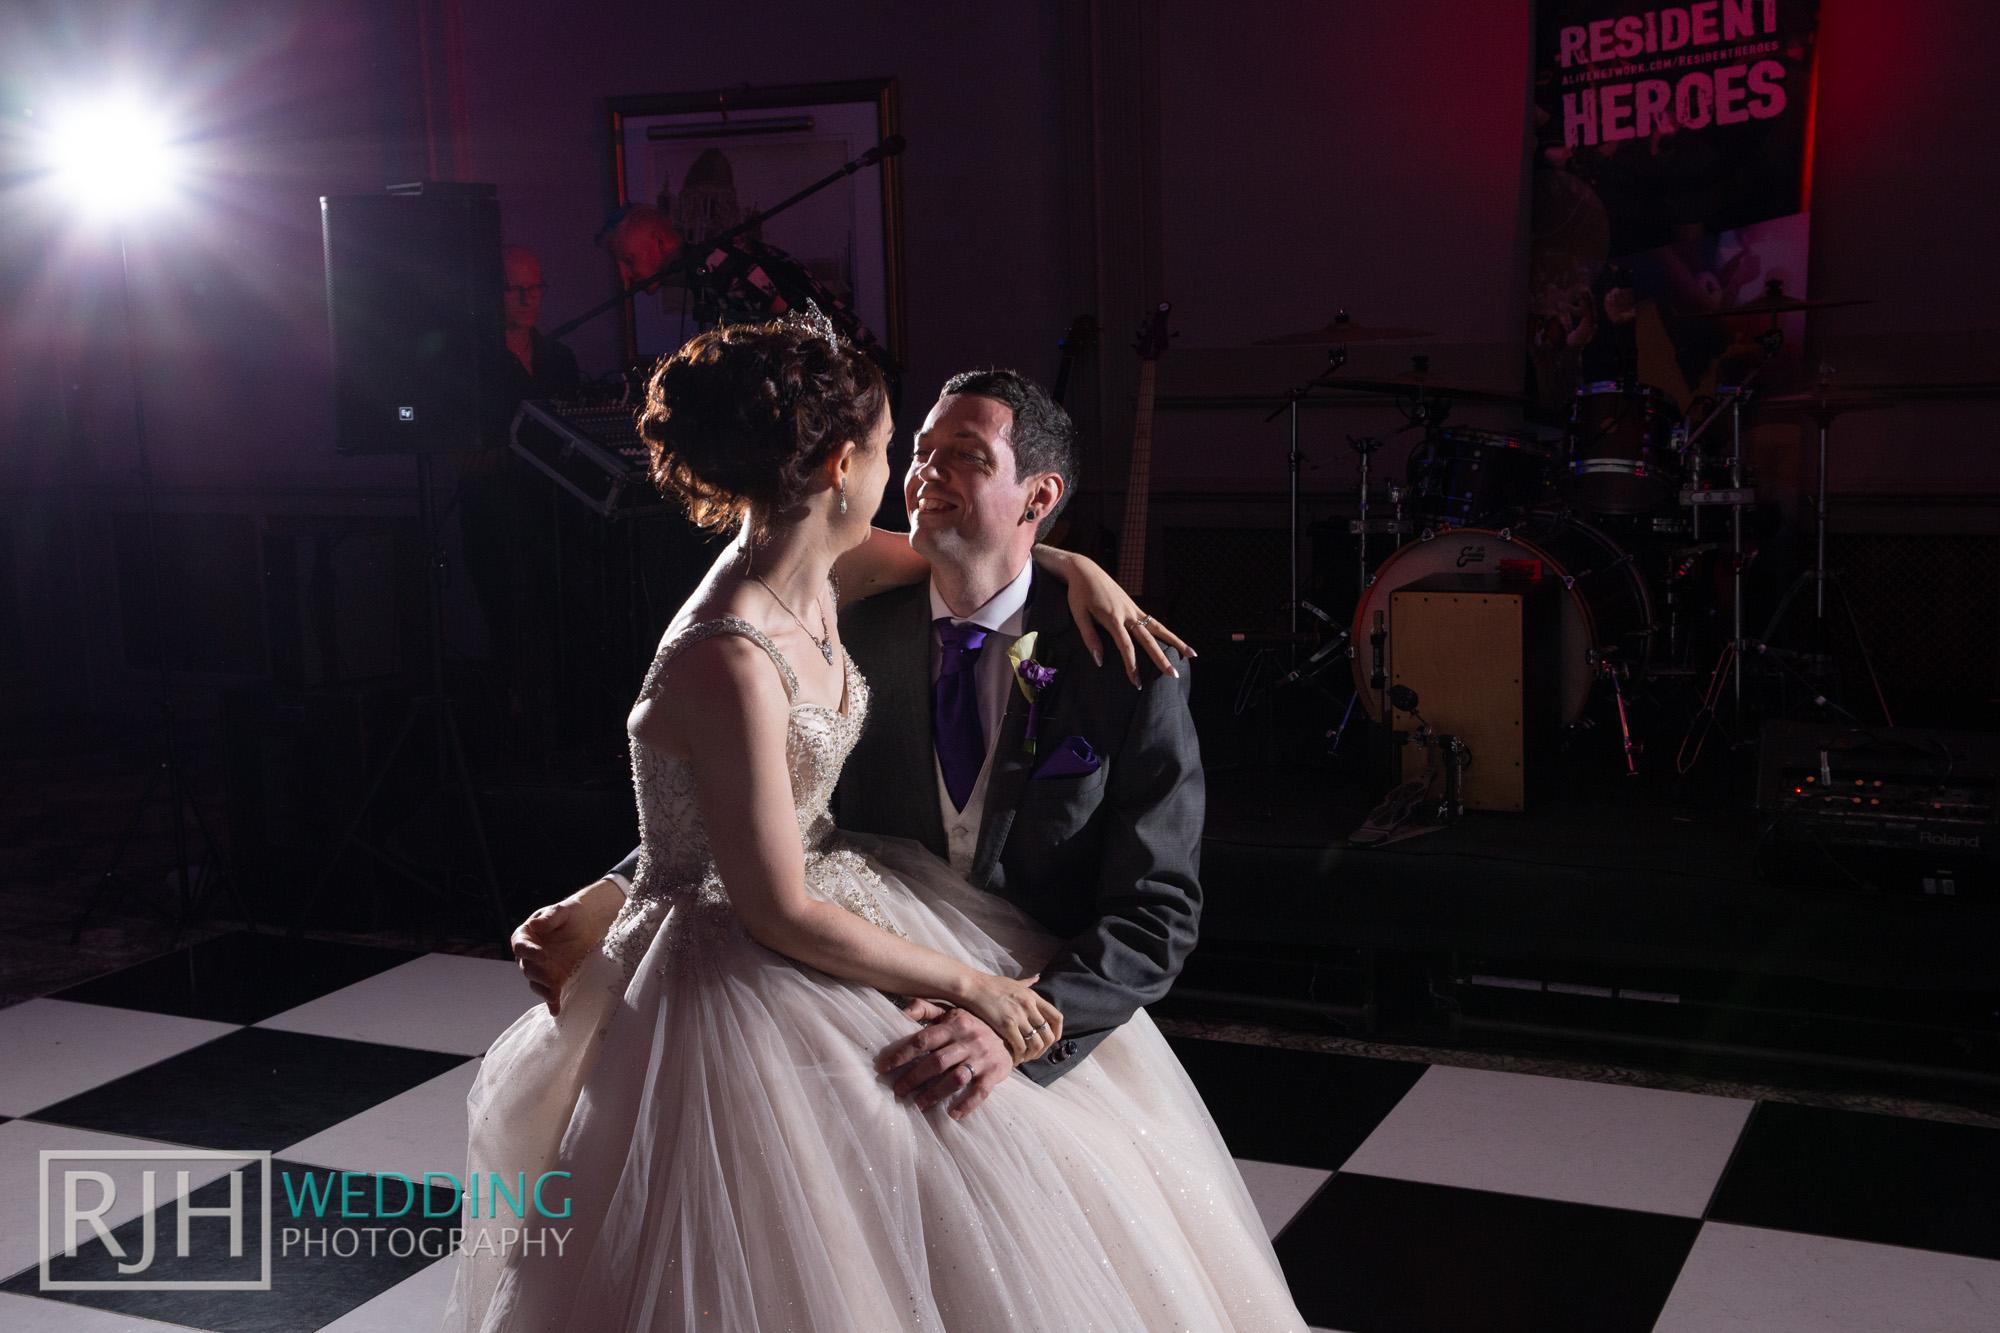 Oulton Hall Wedding Photography_Goodwill-Hall_057_IMG_7053.jpg